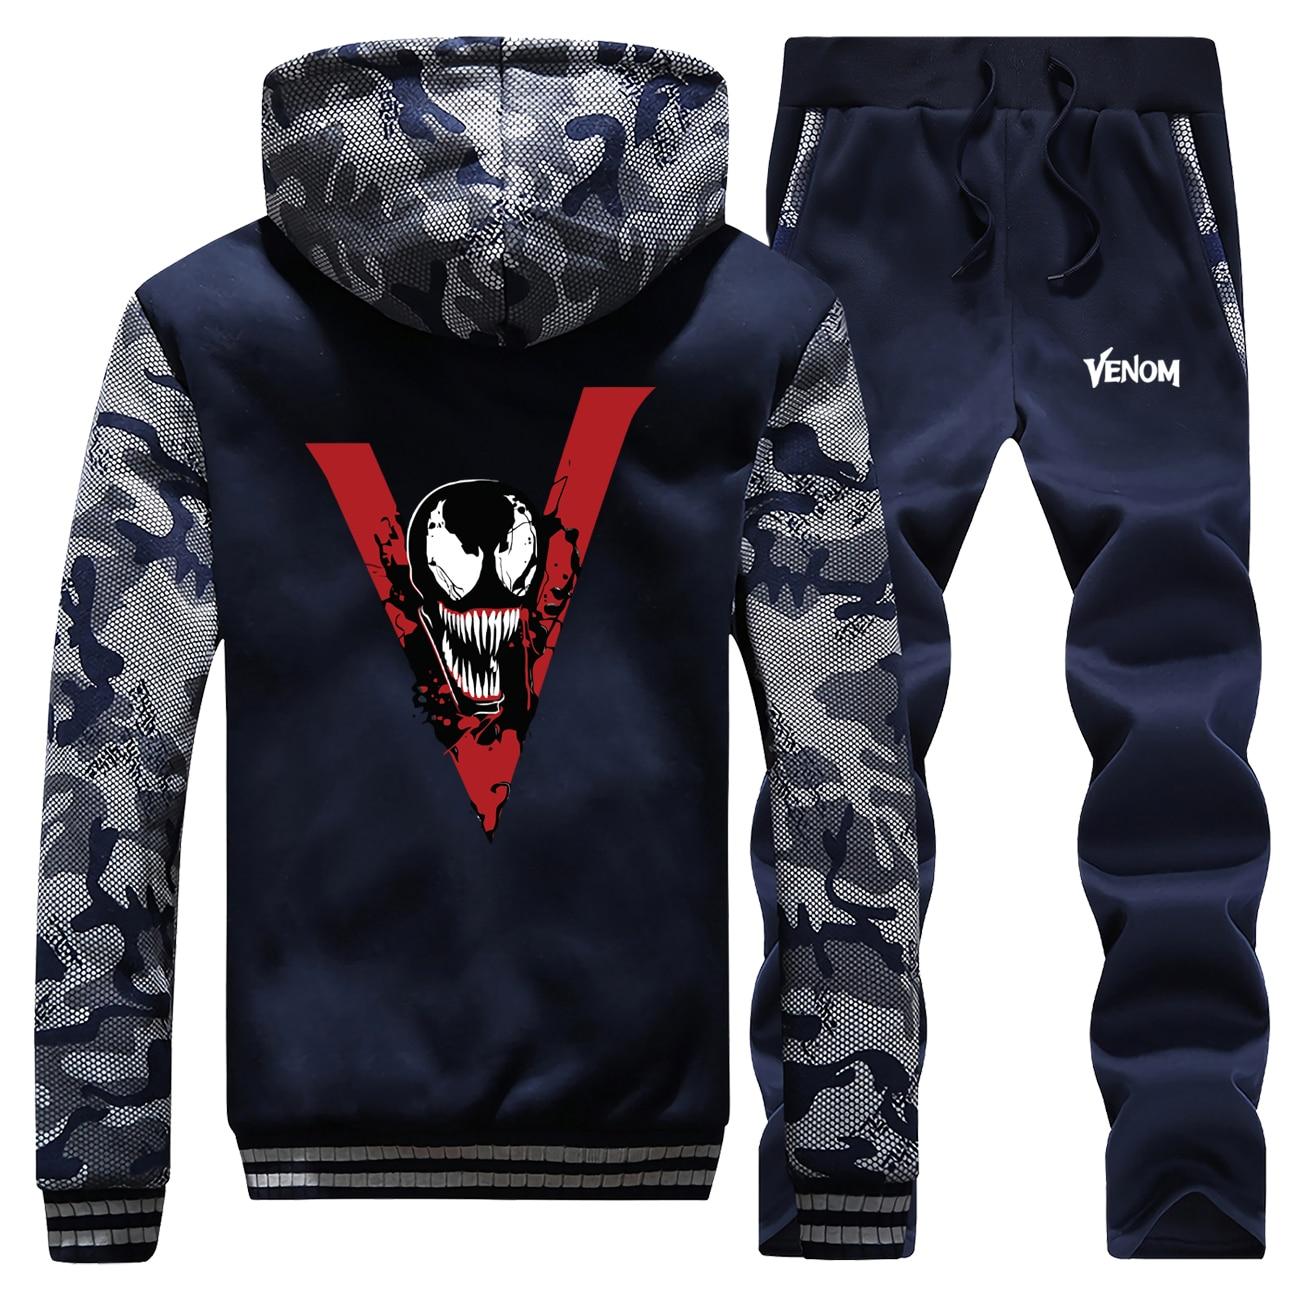 Venom Men's Sets Super Hero Print Camo Jackets Set Casual Winter Sportswear Tracksuit Eddie Anti Hero Fleece Pants Sweatshirts